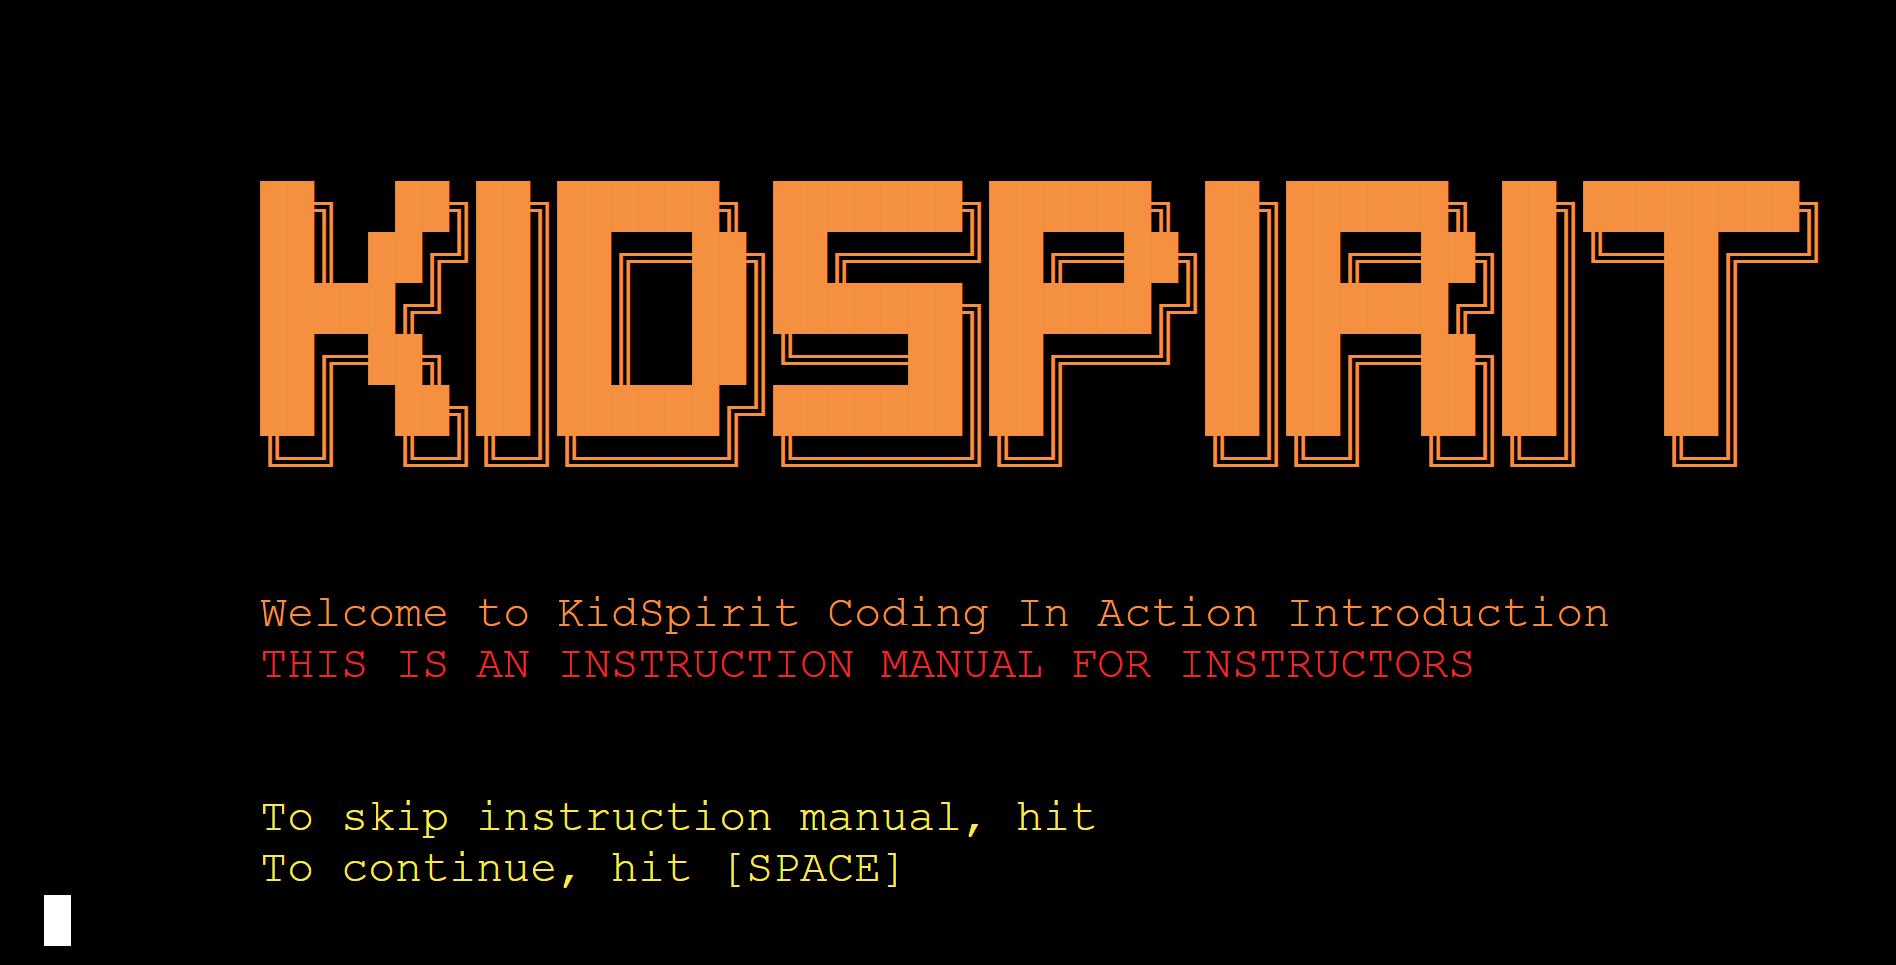 https://cloud-6r1h364ol.vercel.app/0kidspirit_coding_in_action_c___animation_2.png